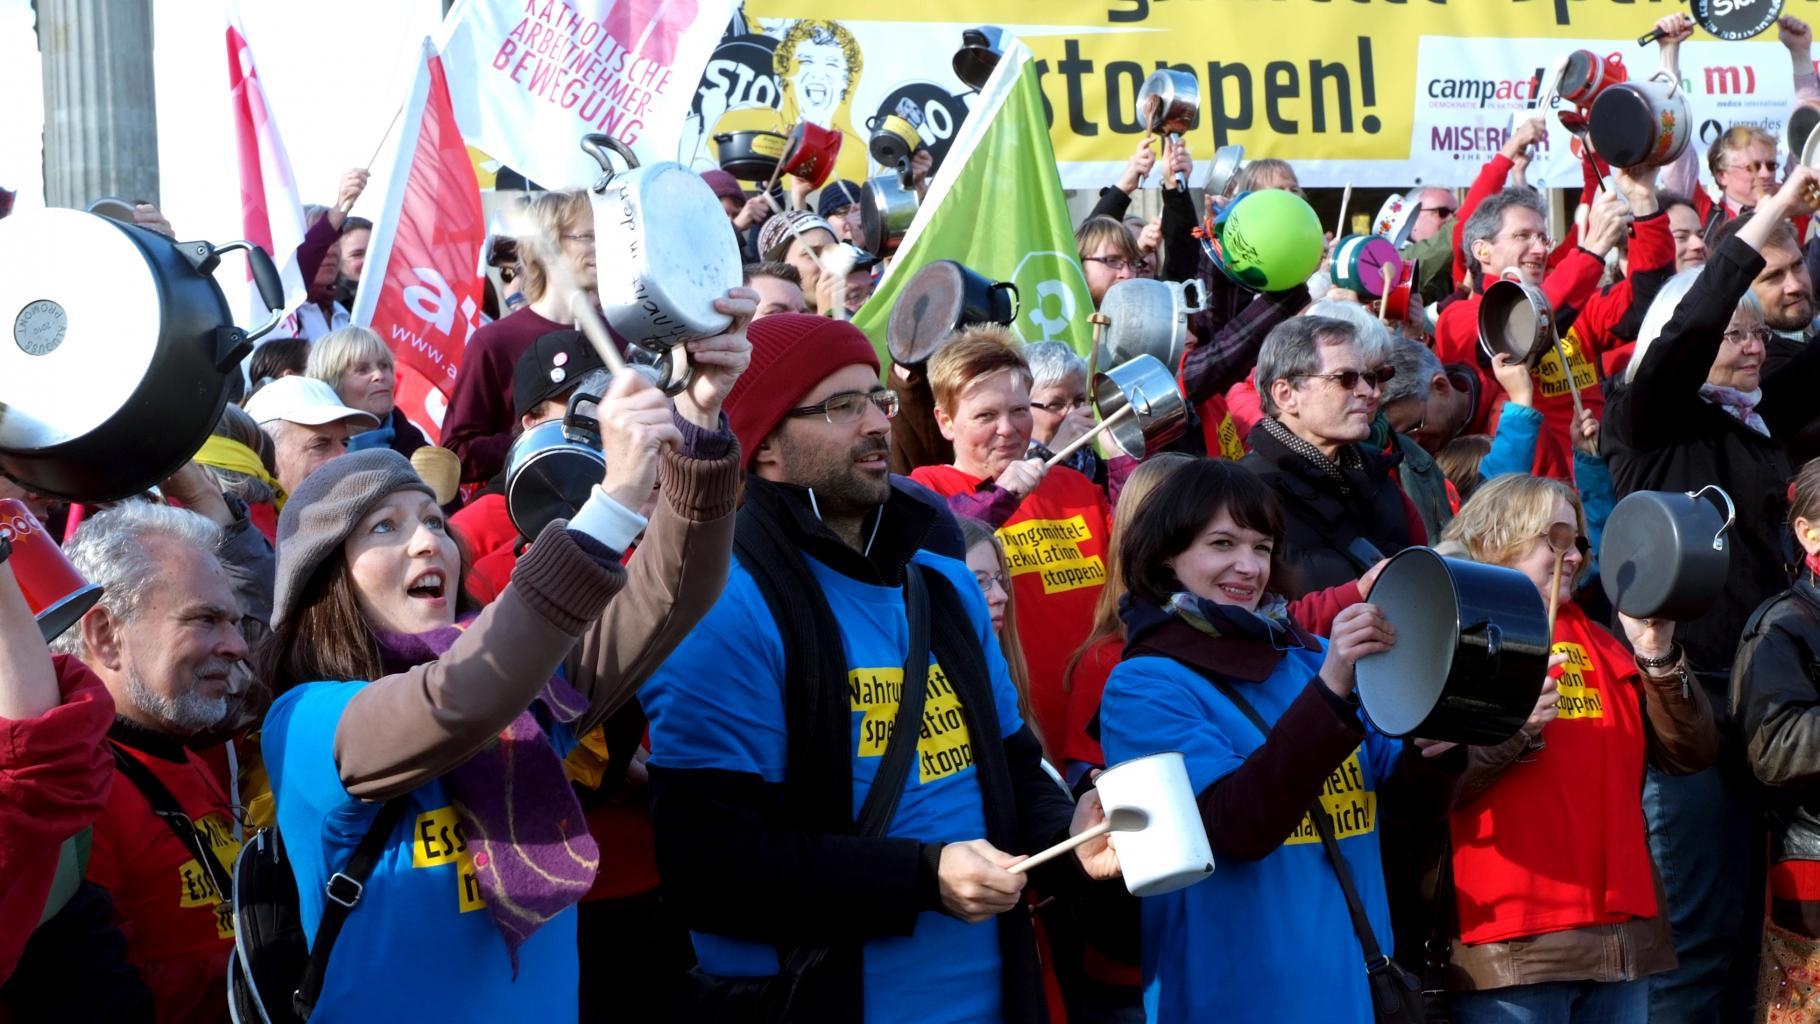 © Henning Lüders/Oxfam